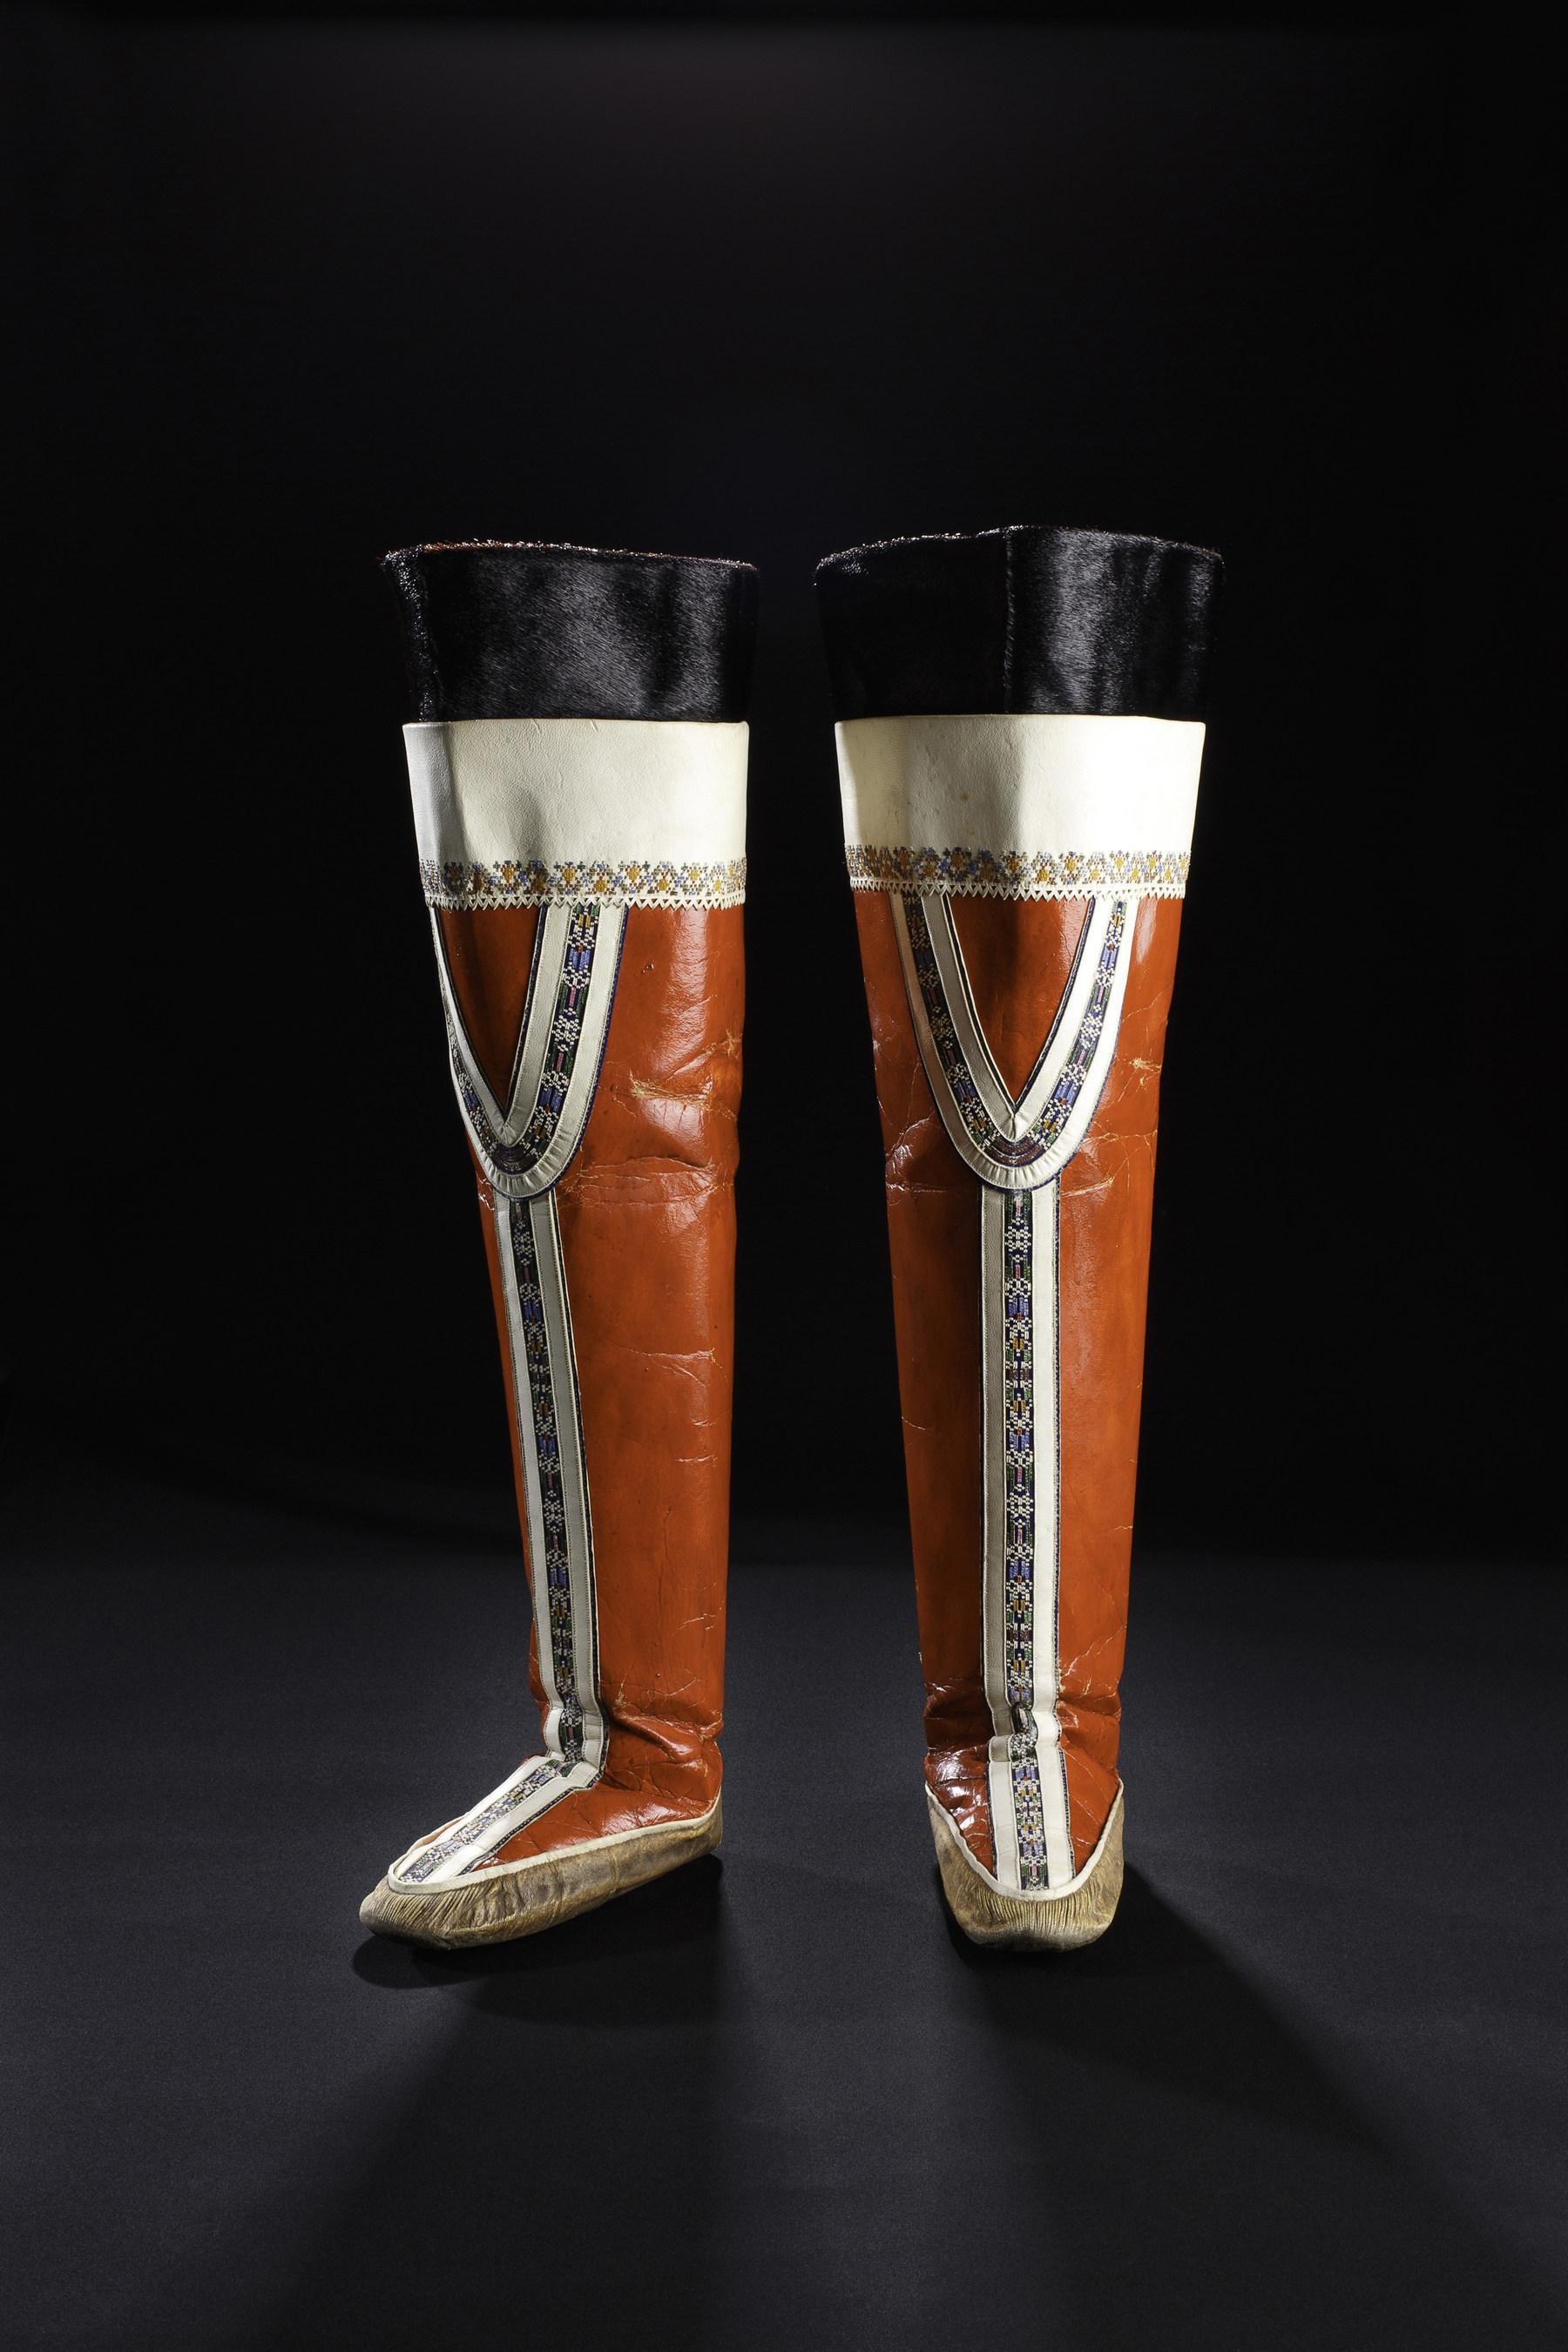 Toronto's Bata Shoe Museum Opens Exhibition Featuring Rare Arctic Footwear